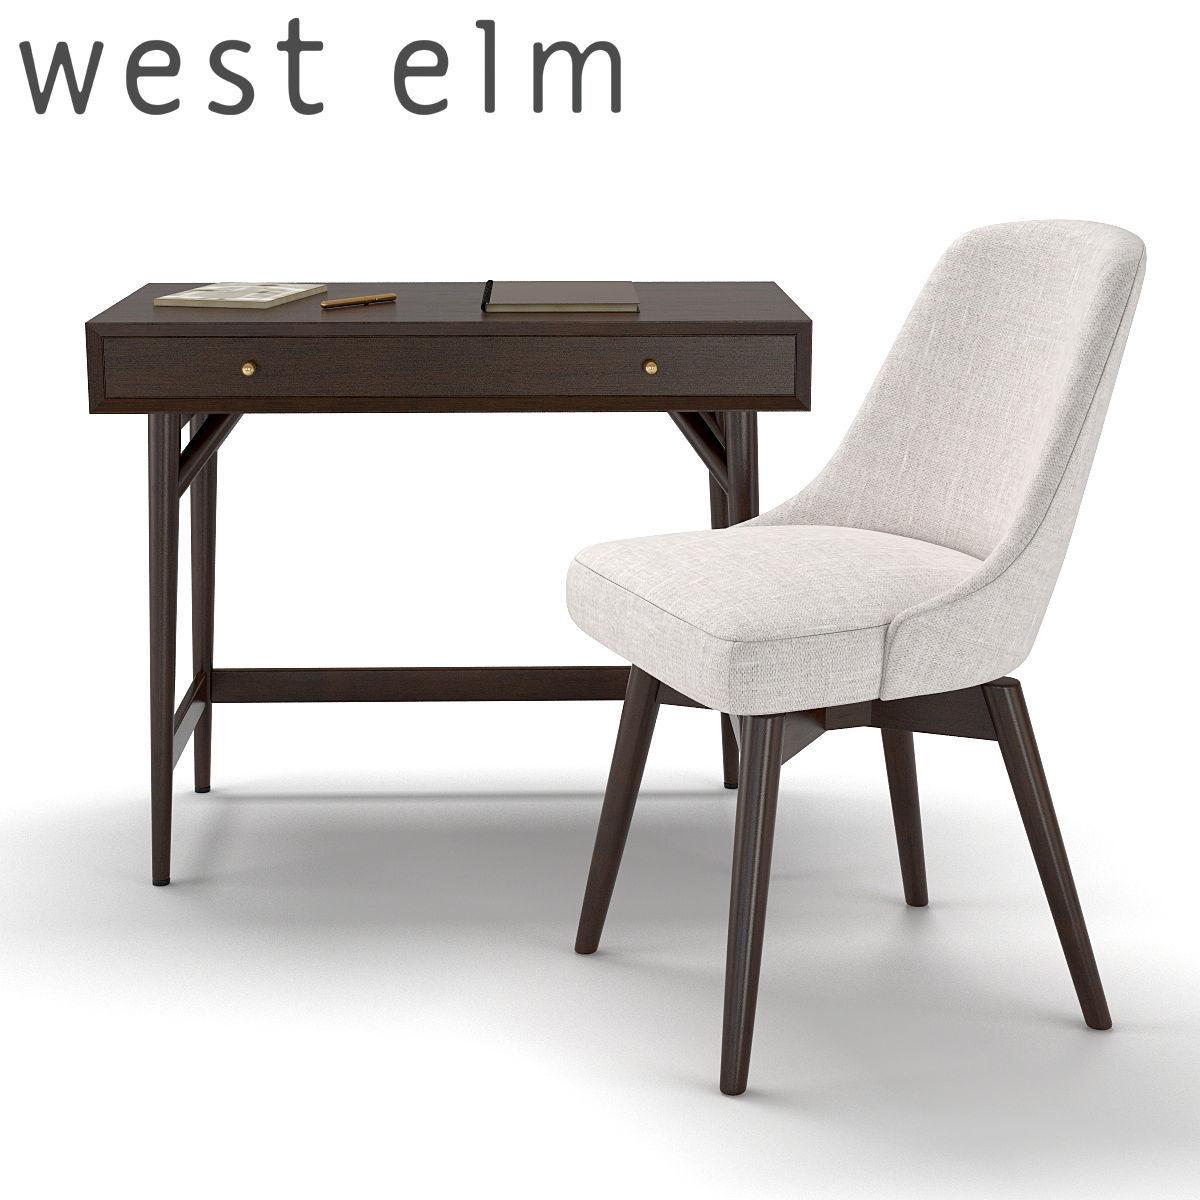 west elm office. West Elm Mid-century Mini Desk - Dark Mineral And Swivel Office 3d Model Max